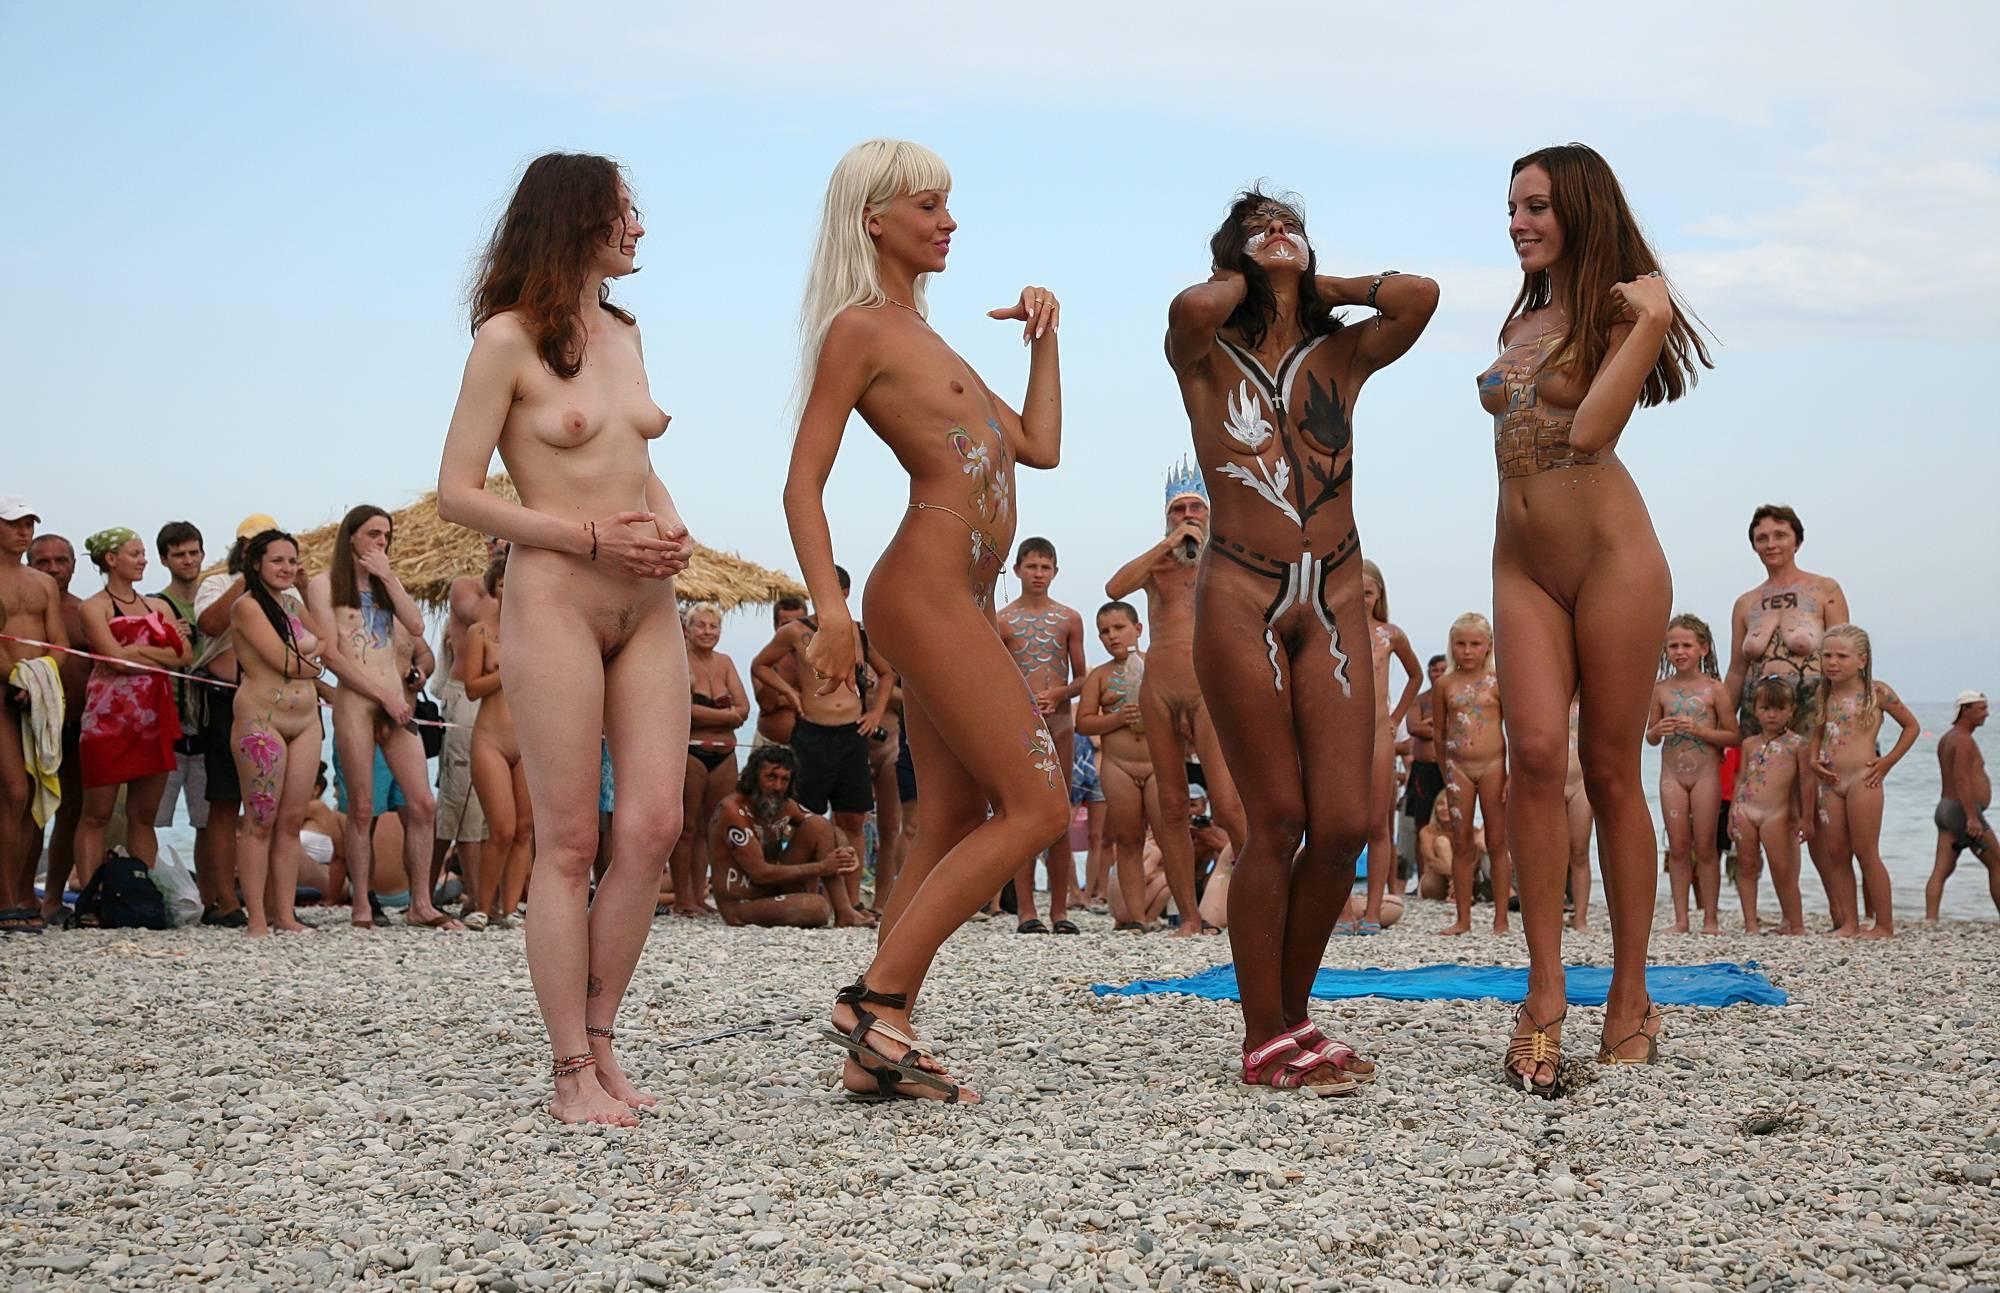 Nudist Pictures Body Art Demonstration - 2